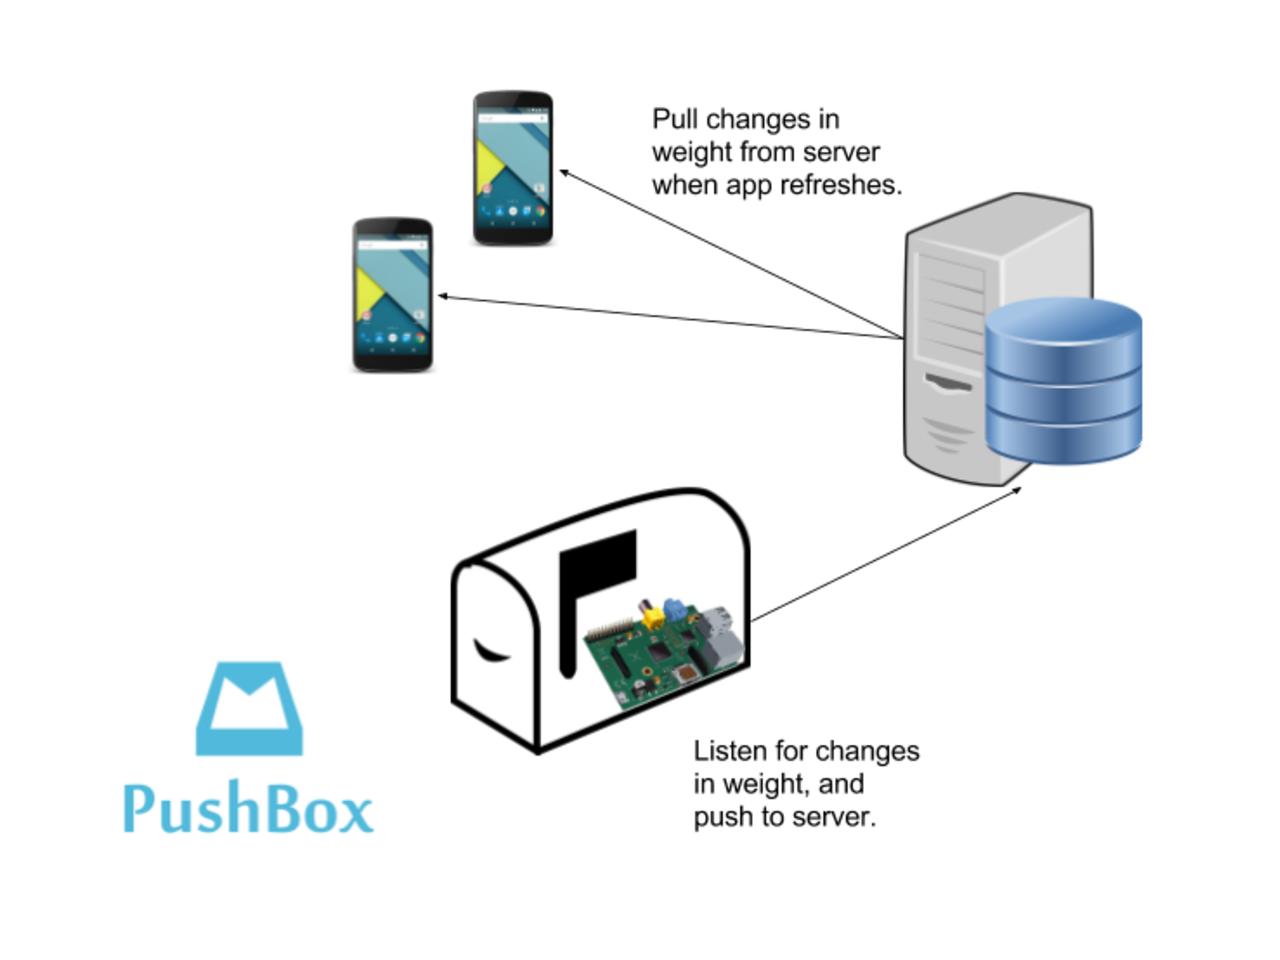 PushBox